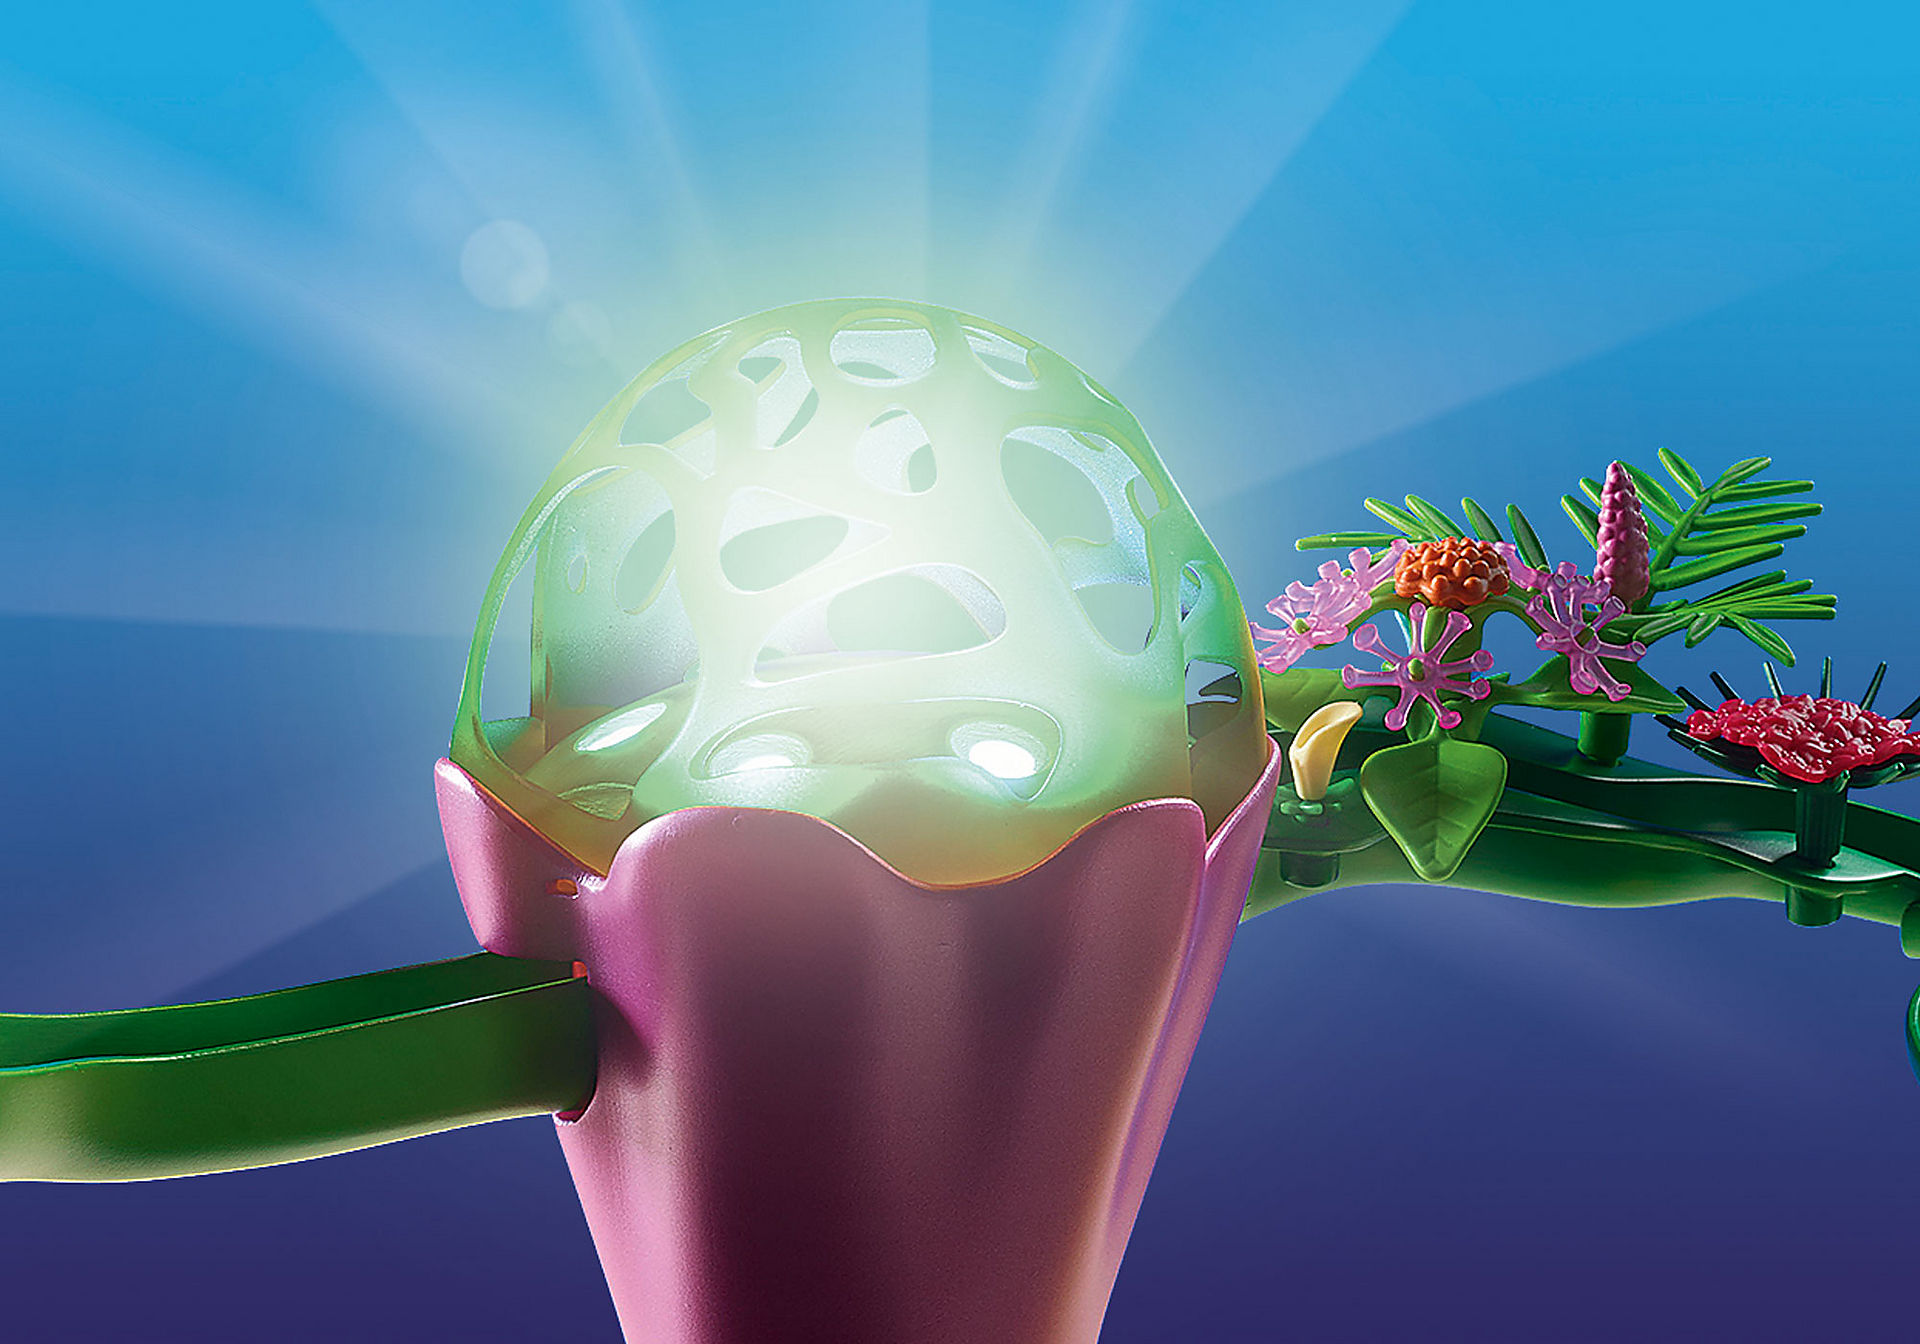 70094 Mermaid Cove with Illuminated Dome zoom image6